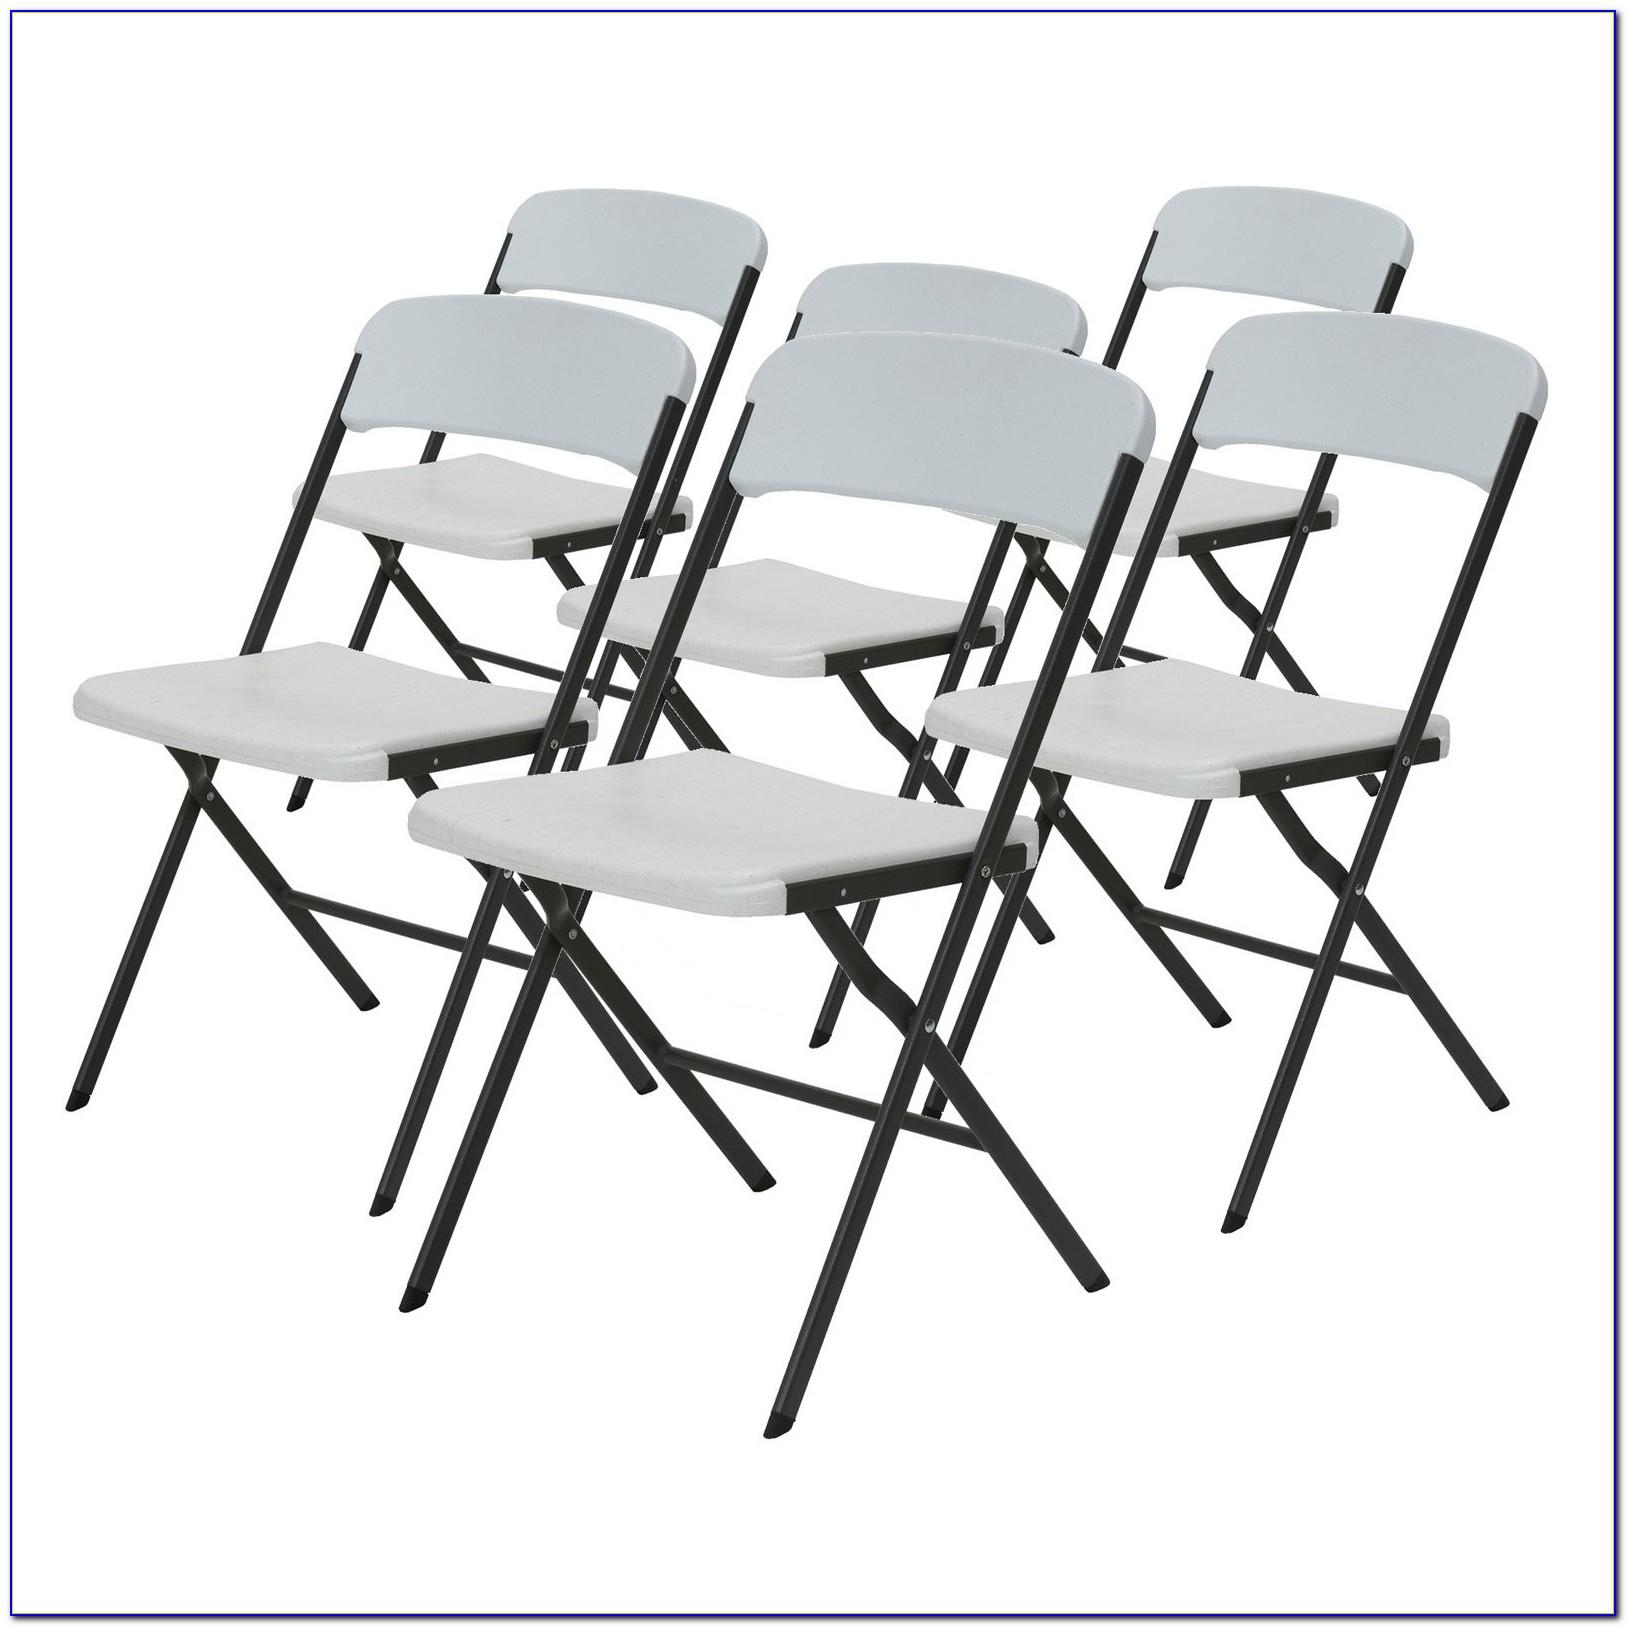 Lifetime Folding Chairs Amazon